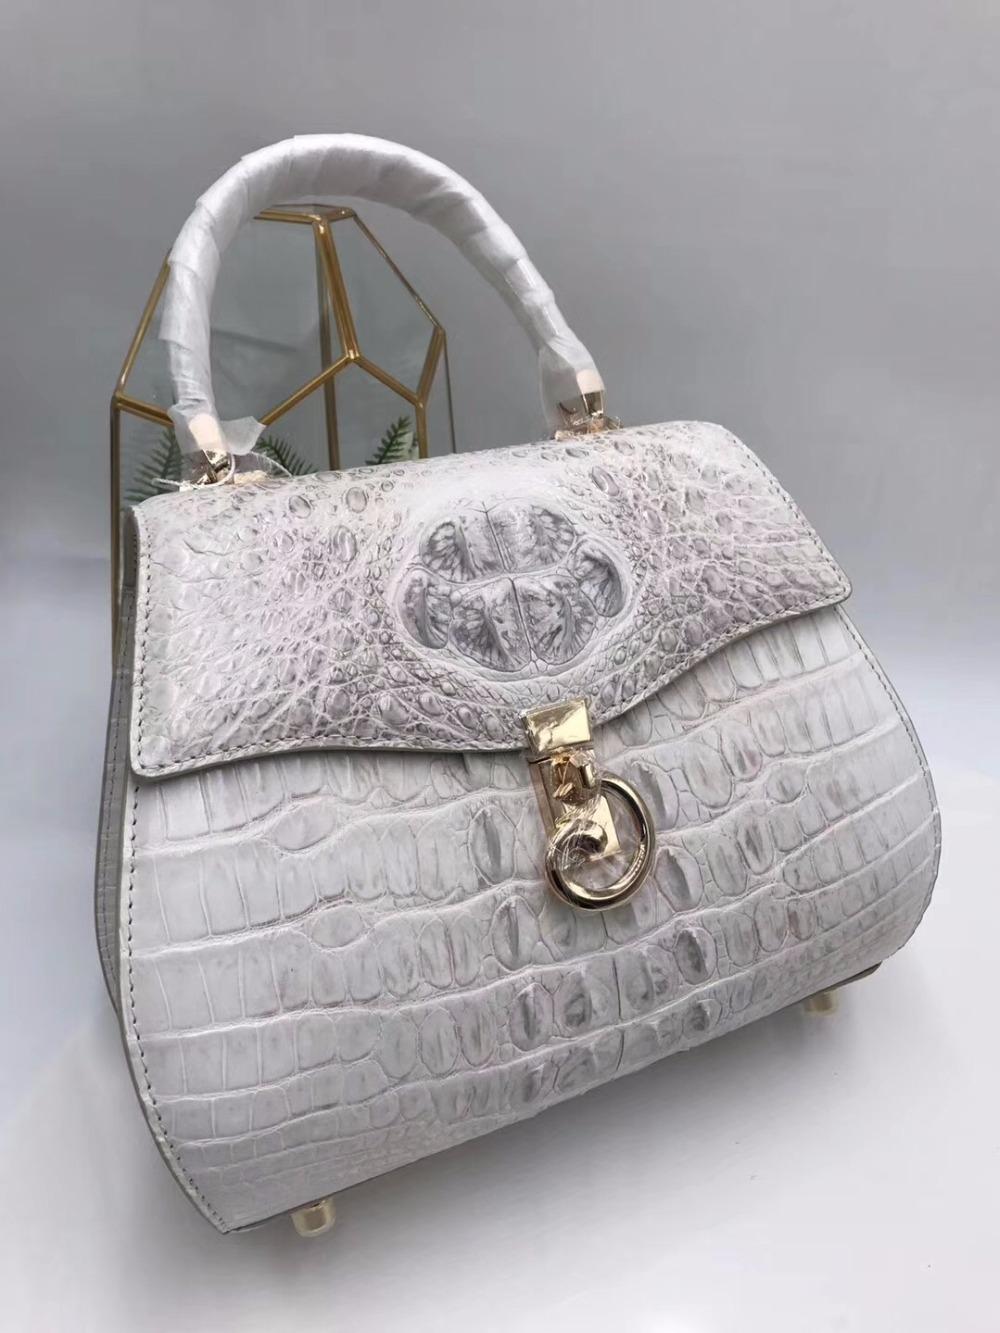 9a73fc37739b Luxury Famous Designer Genuine Crocodile Skin Exotic Alligator Leather  Ladies Saddle Handbag Female Orange Shoulder Bag Purse Saddle Handbag Bag  Purse ...